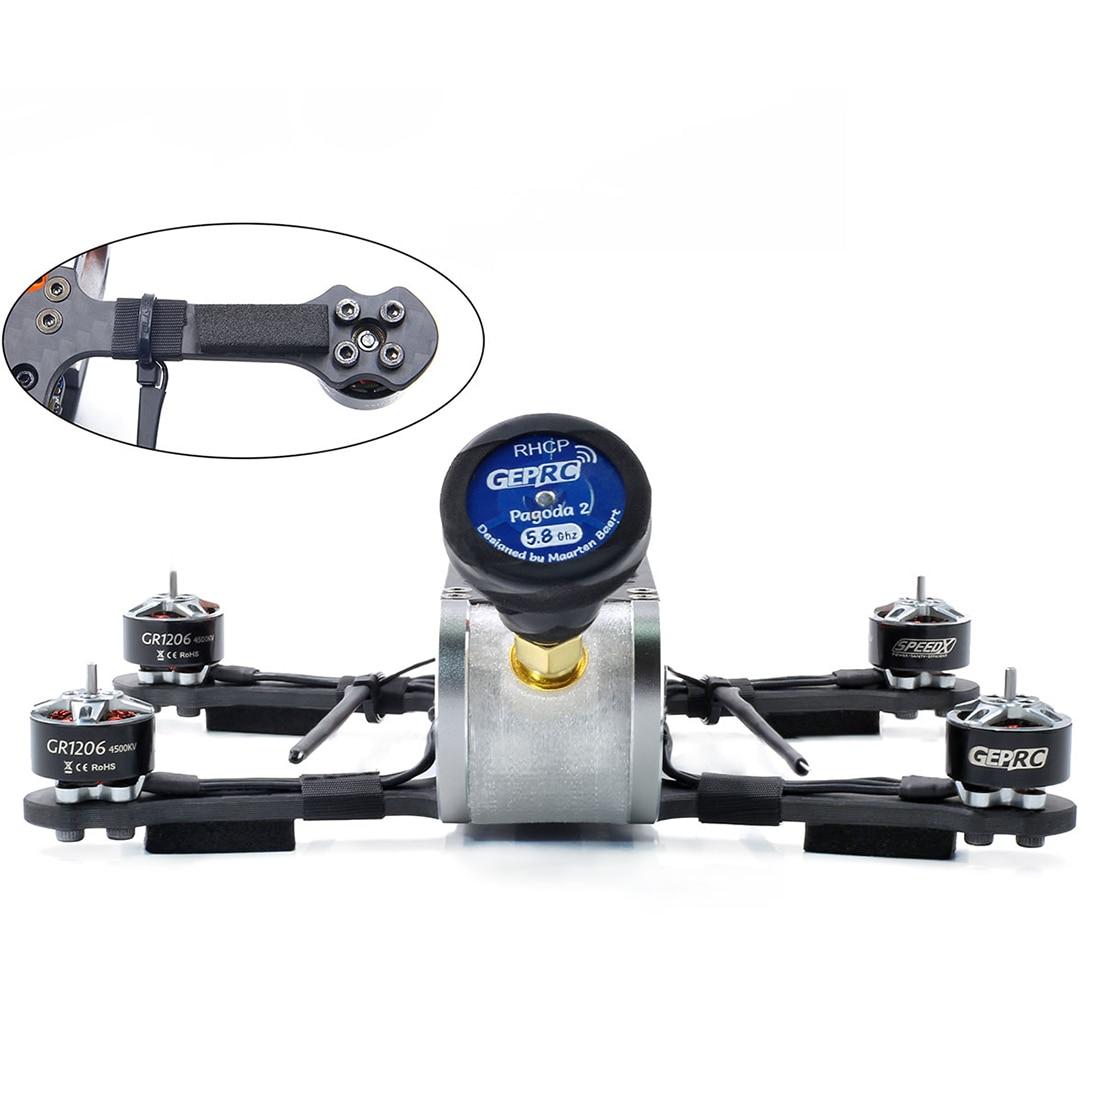 GEPRC GEP CX Cygnet 145mm 3 Inch Stable F4 20A 48CH RunCam Split Mini 2 1080P HD Camera 4500kv Motor RC FPV Racing Drone BNF PNP - 4